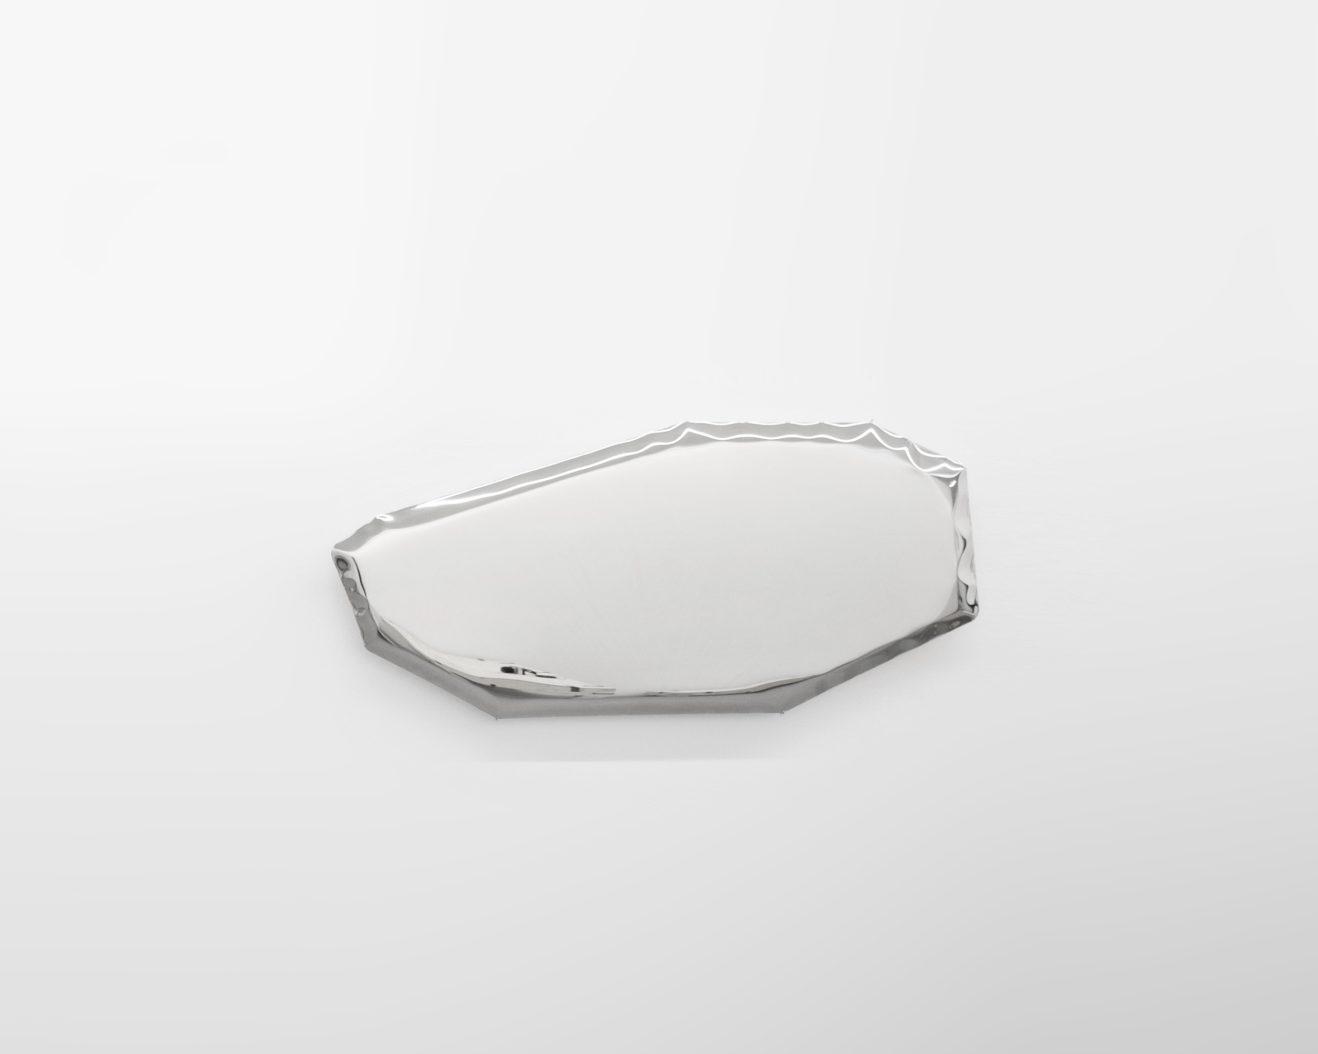 Zieta-Prozessdesign-Tafla-Mirror-Savannah-Bay-Gallery-3